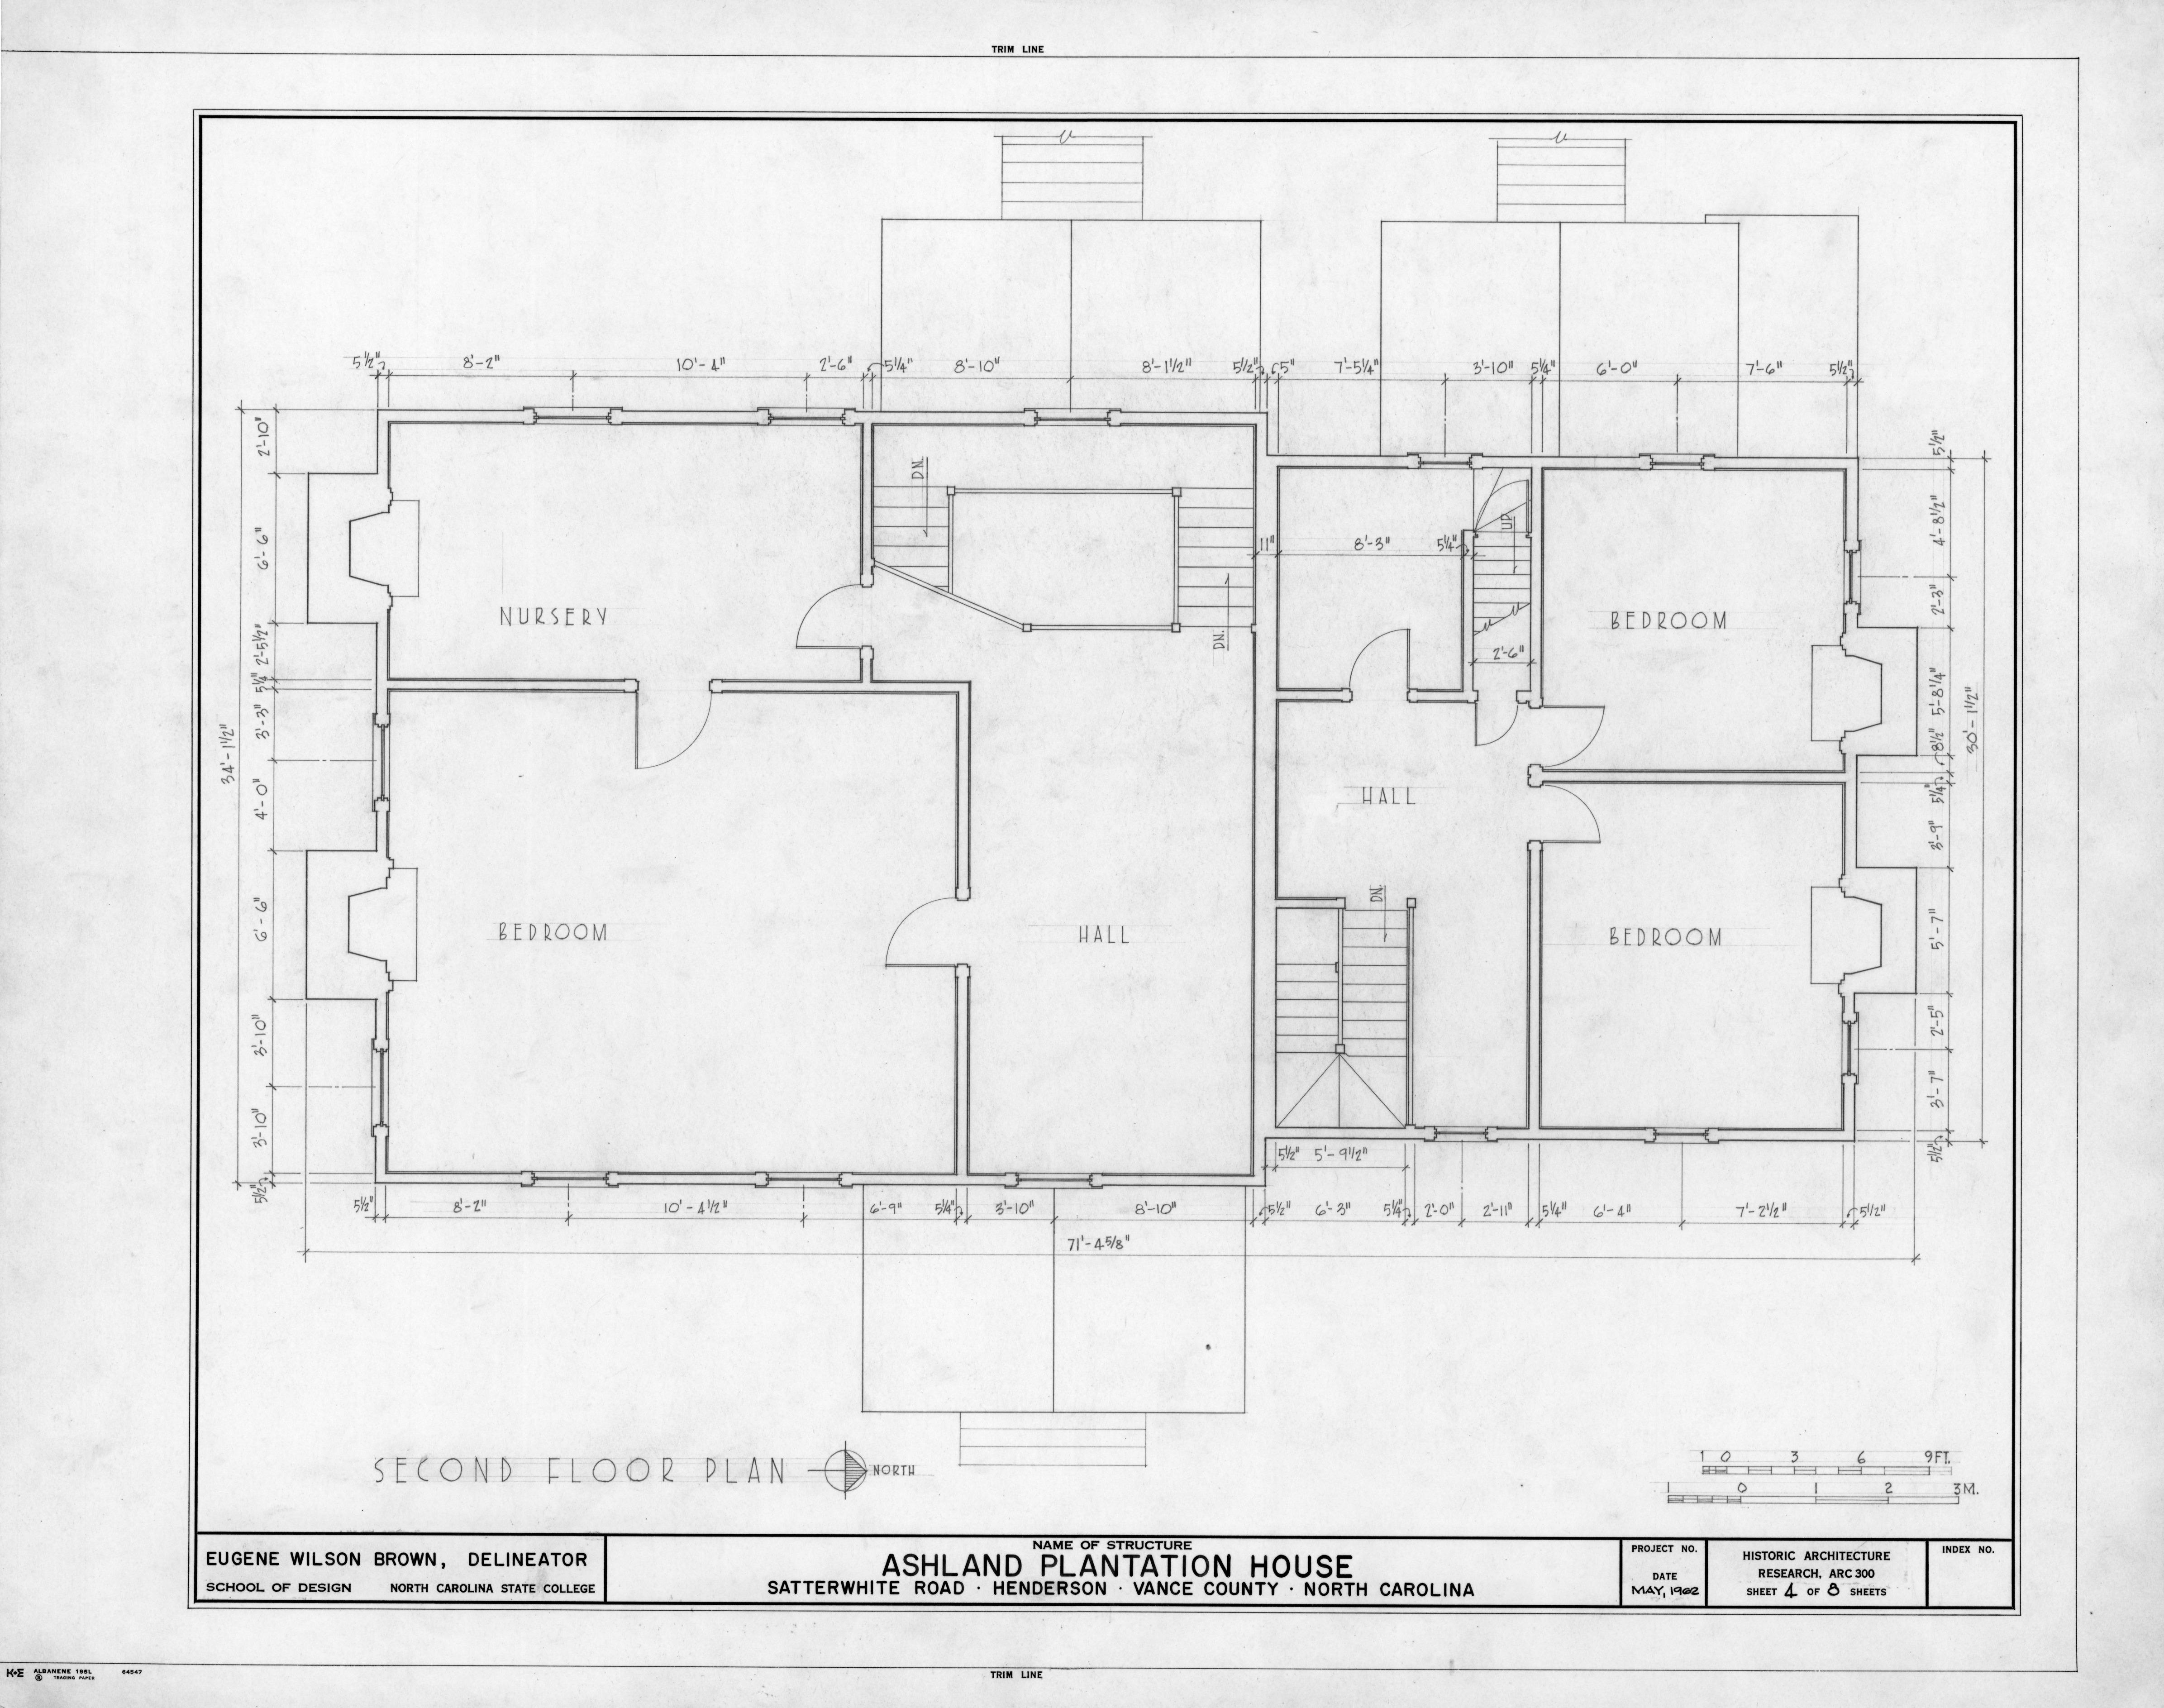 28 home floor plans north carolina north carolina house home floor plans north carolina second floor plan ashland vance county north carolina